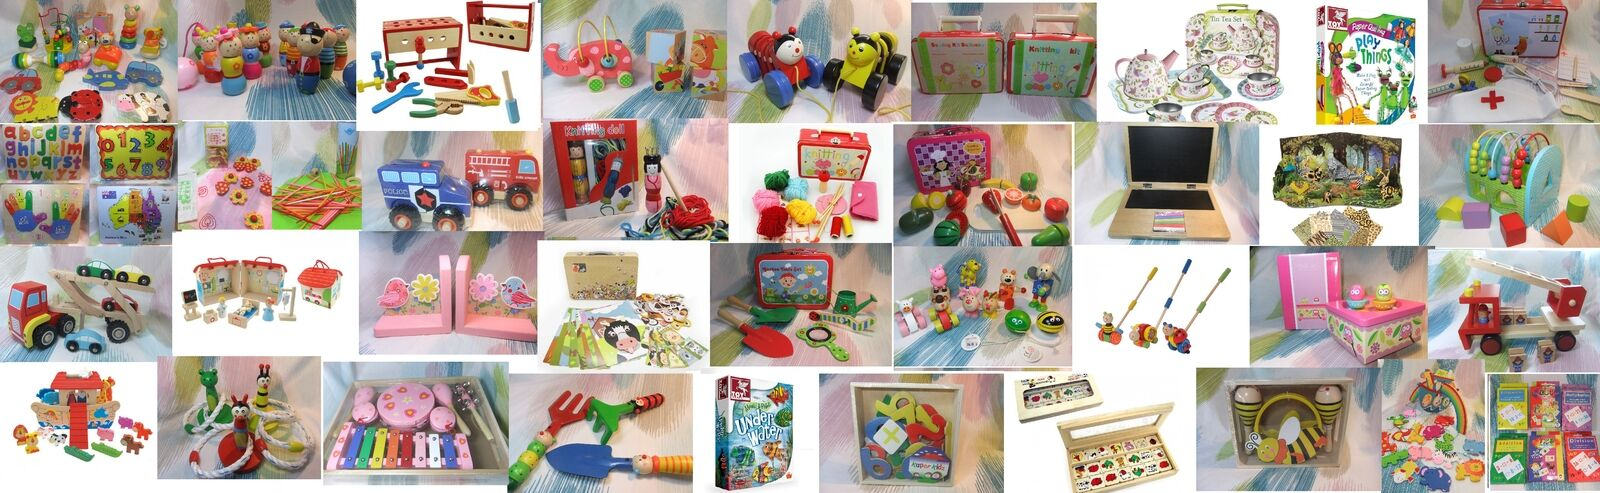 Hiho Toys Australia